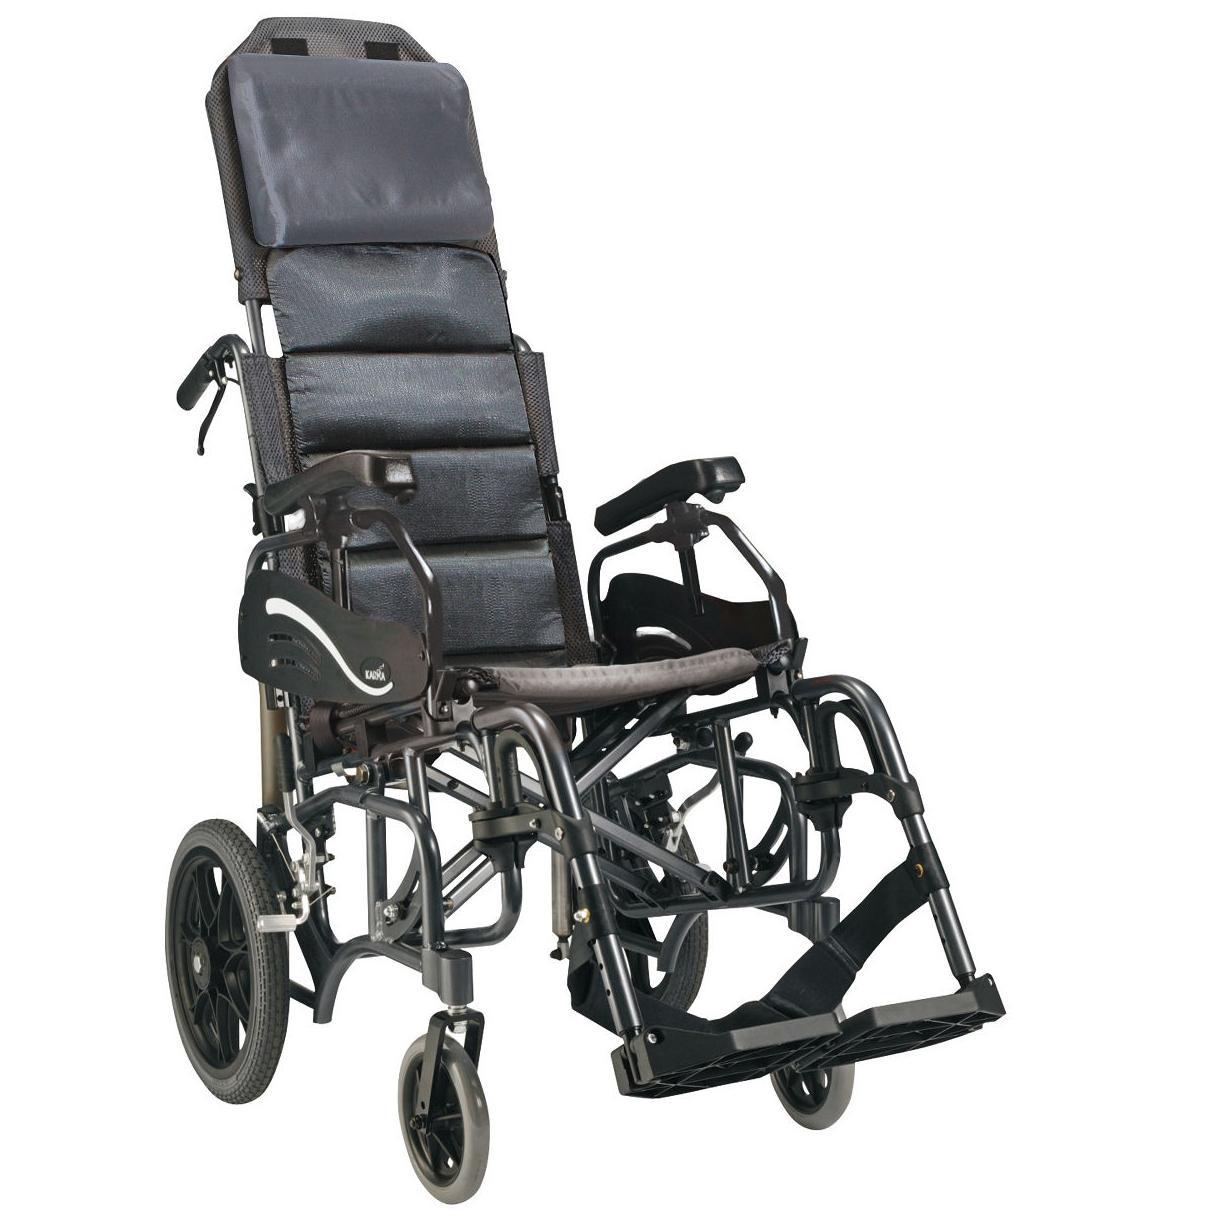 Silla de ruedas basculante : Catálogo de MSB Mundo Sin Barreras